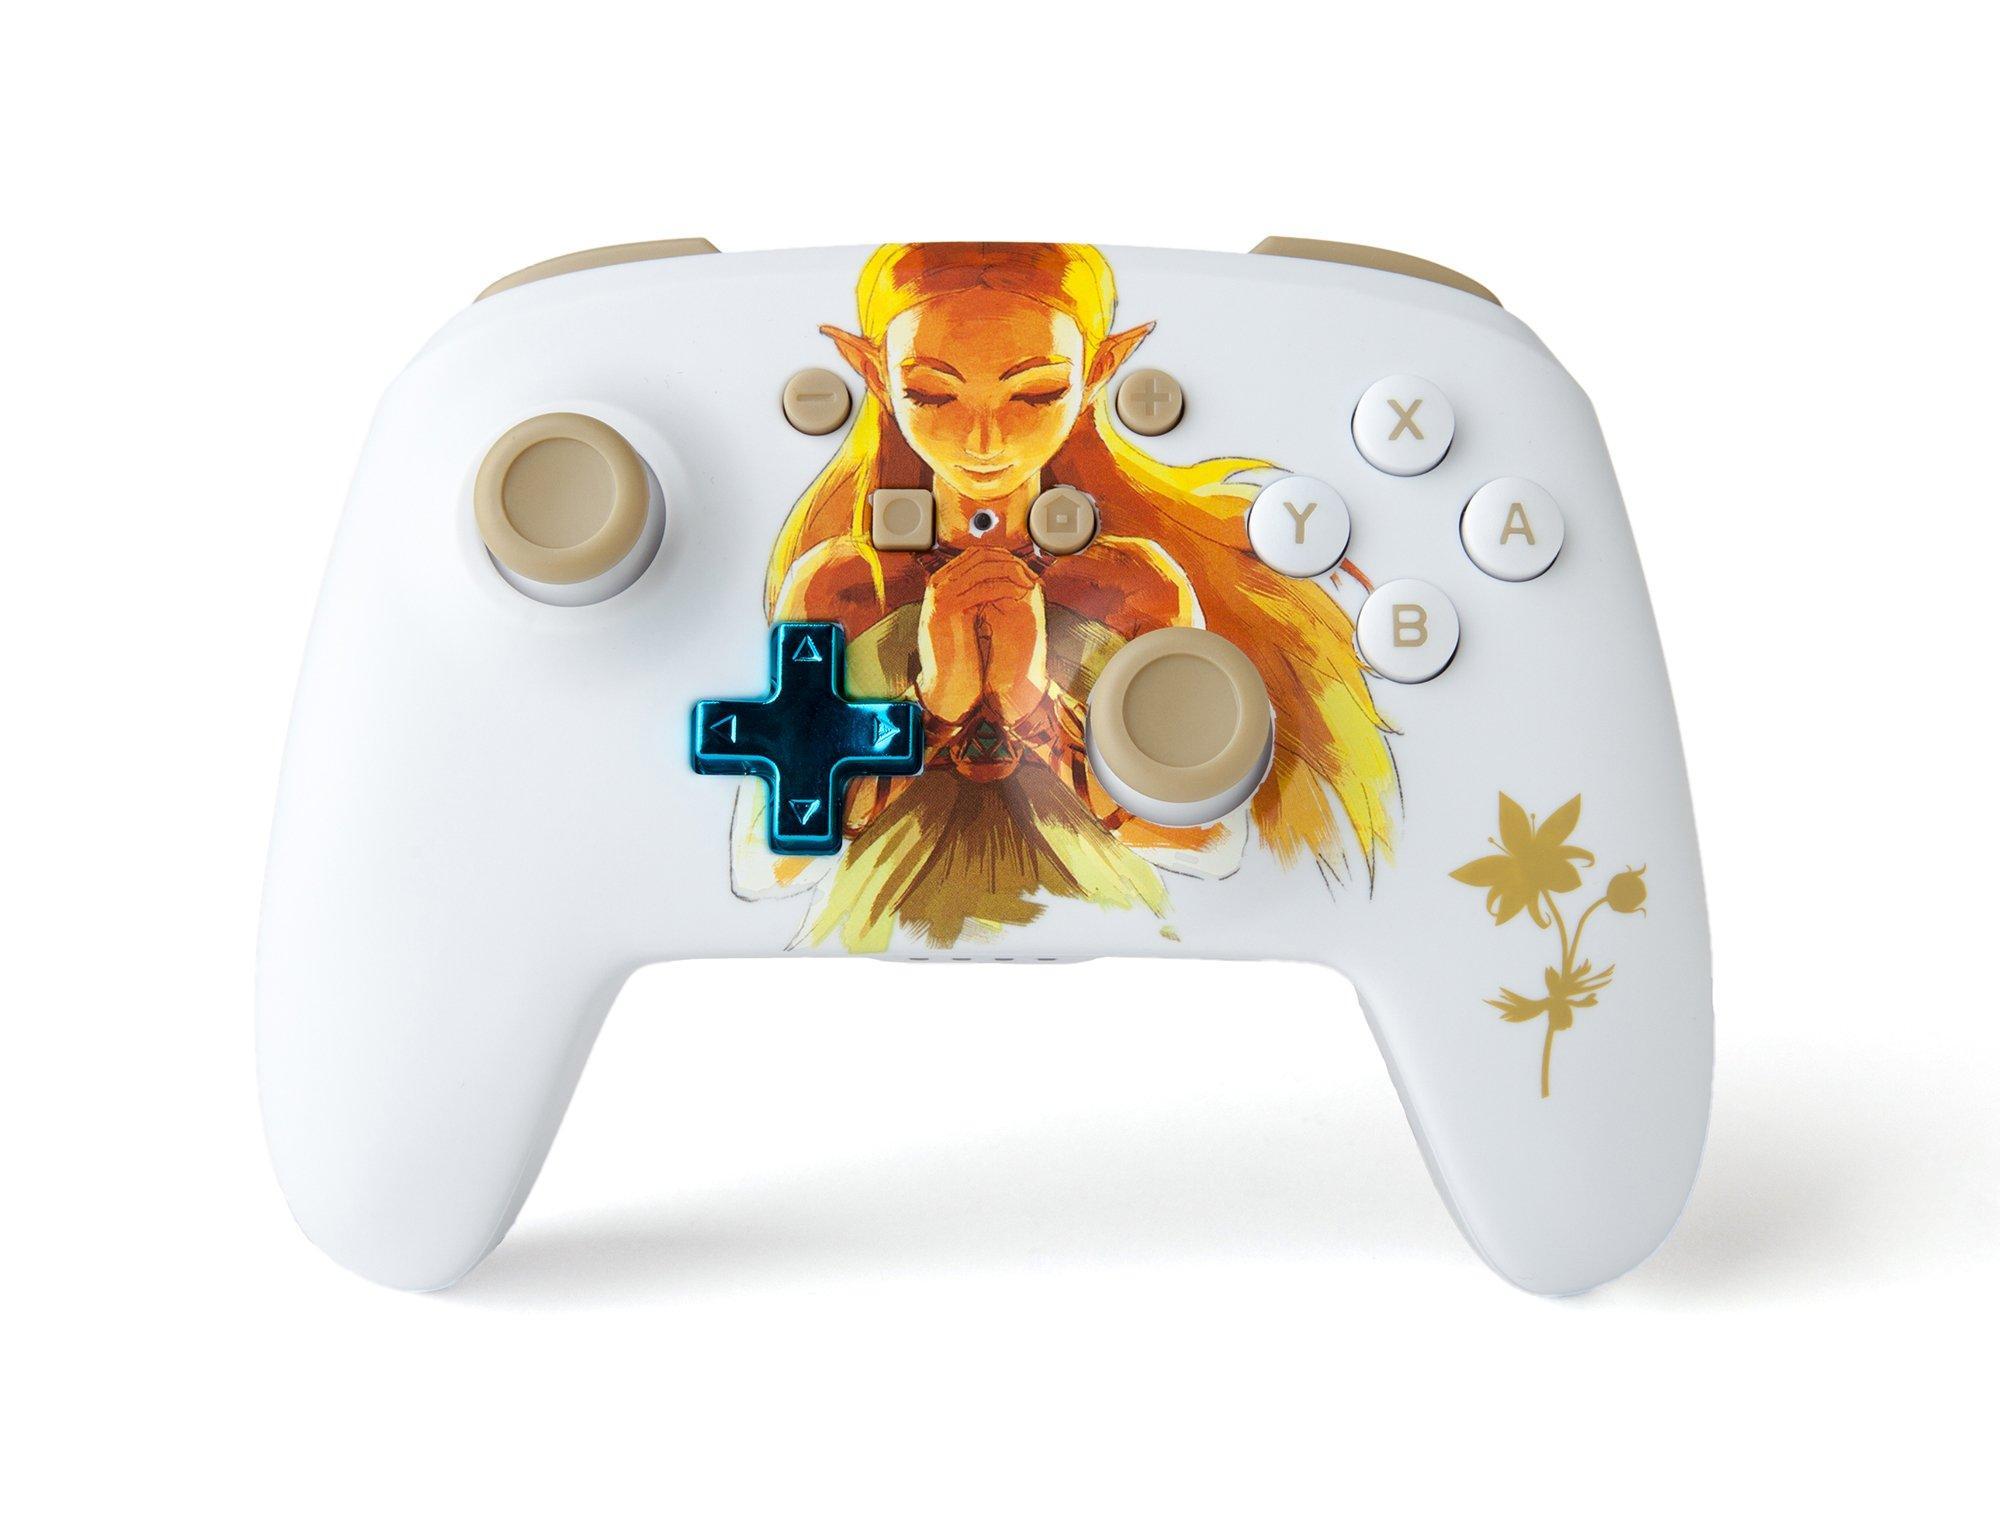 The Legend Of Zelda Princess Zelda Enhanced Wireless Controller For Nintendo Switch Nintendo Switch Gamestop